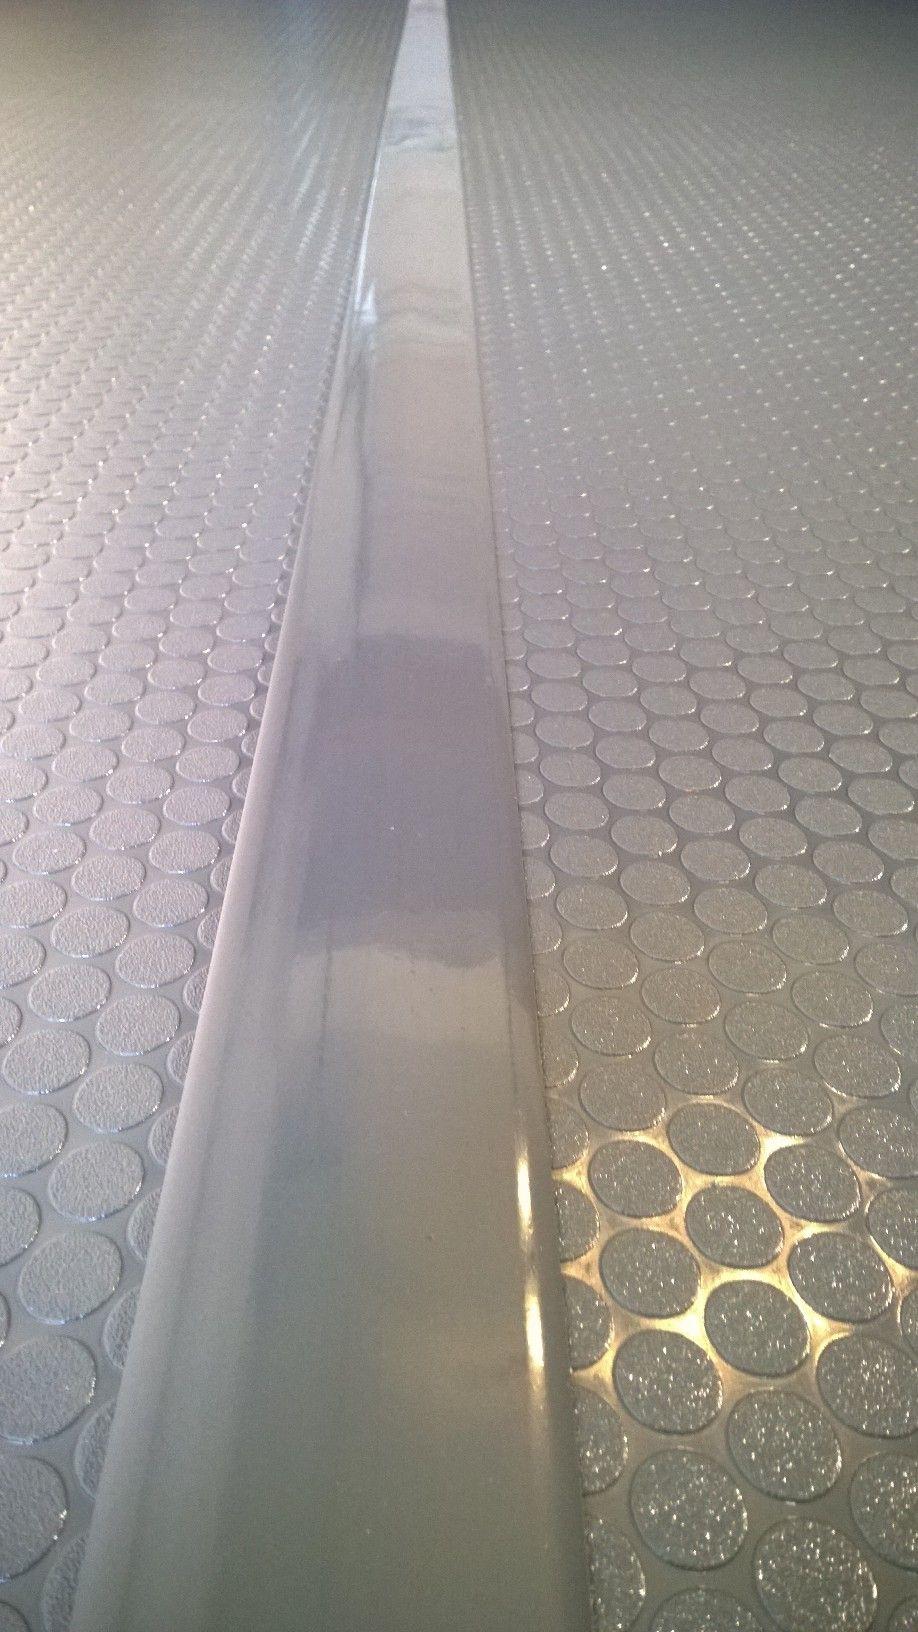 G Floor Mats >> Garage Floor Mats American Made Blt G Floor Trucontain Containment